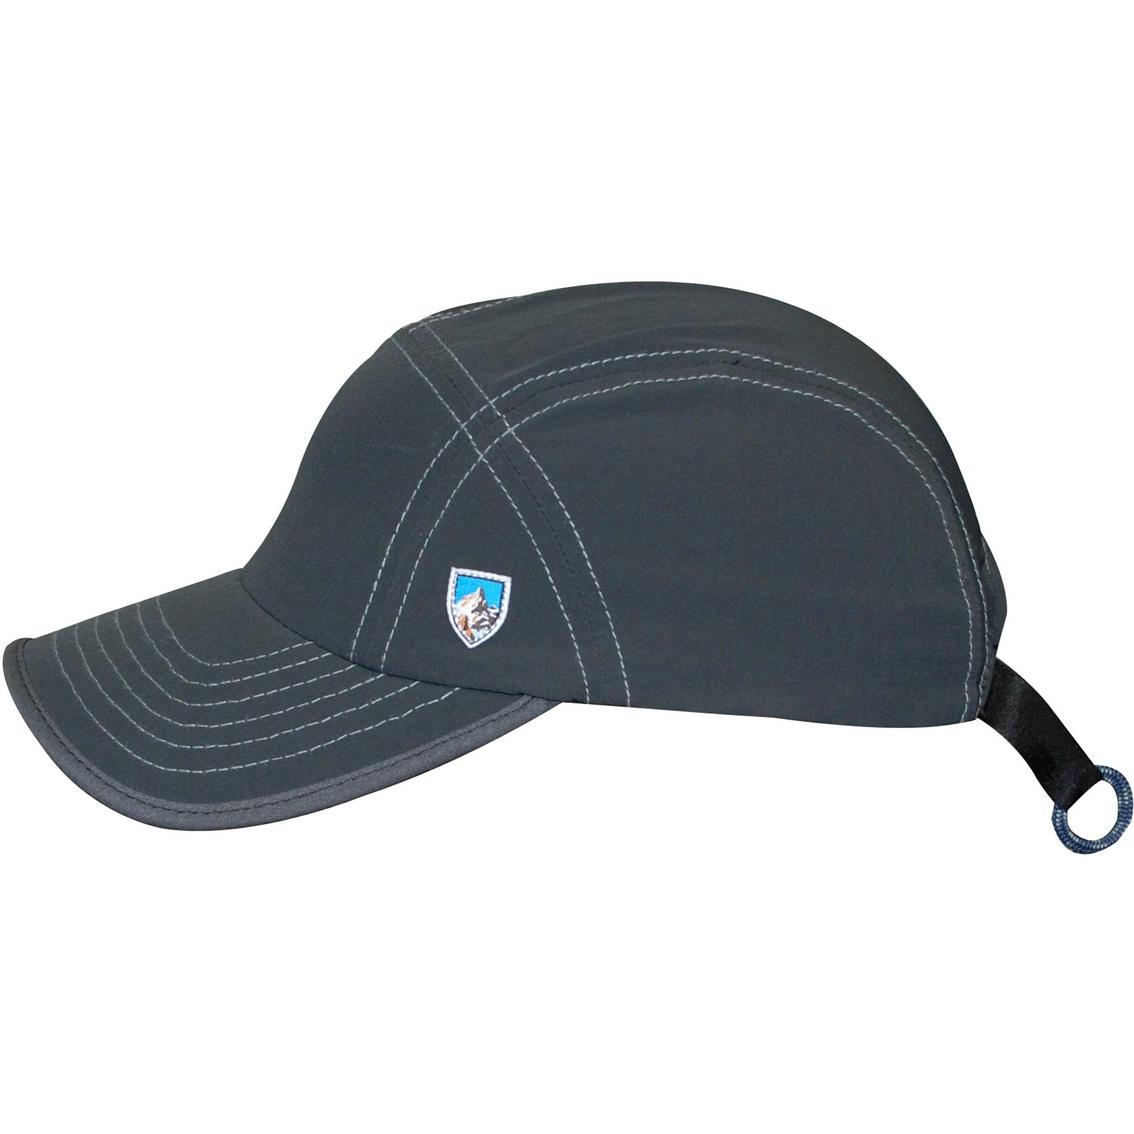 891307092 Kuhl Renegade Cap | Hats | Apparel | Shop The Exchange